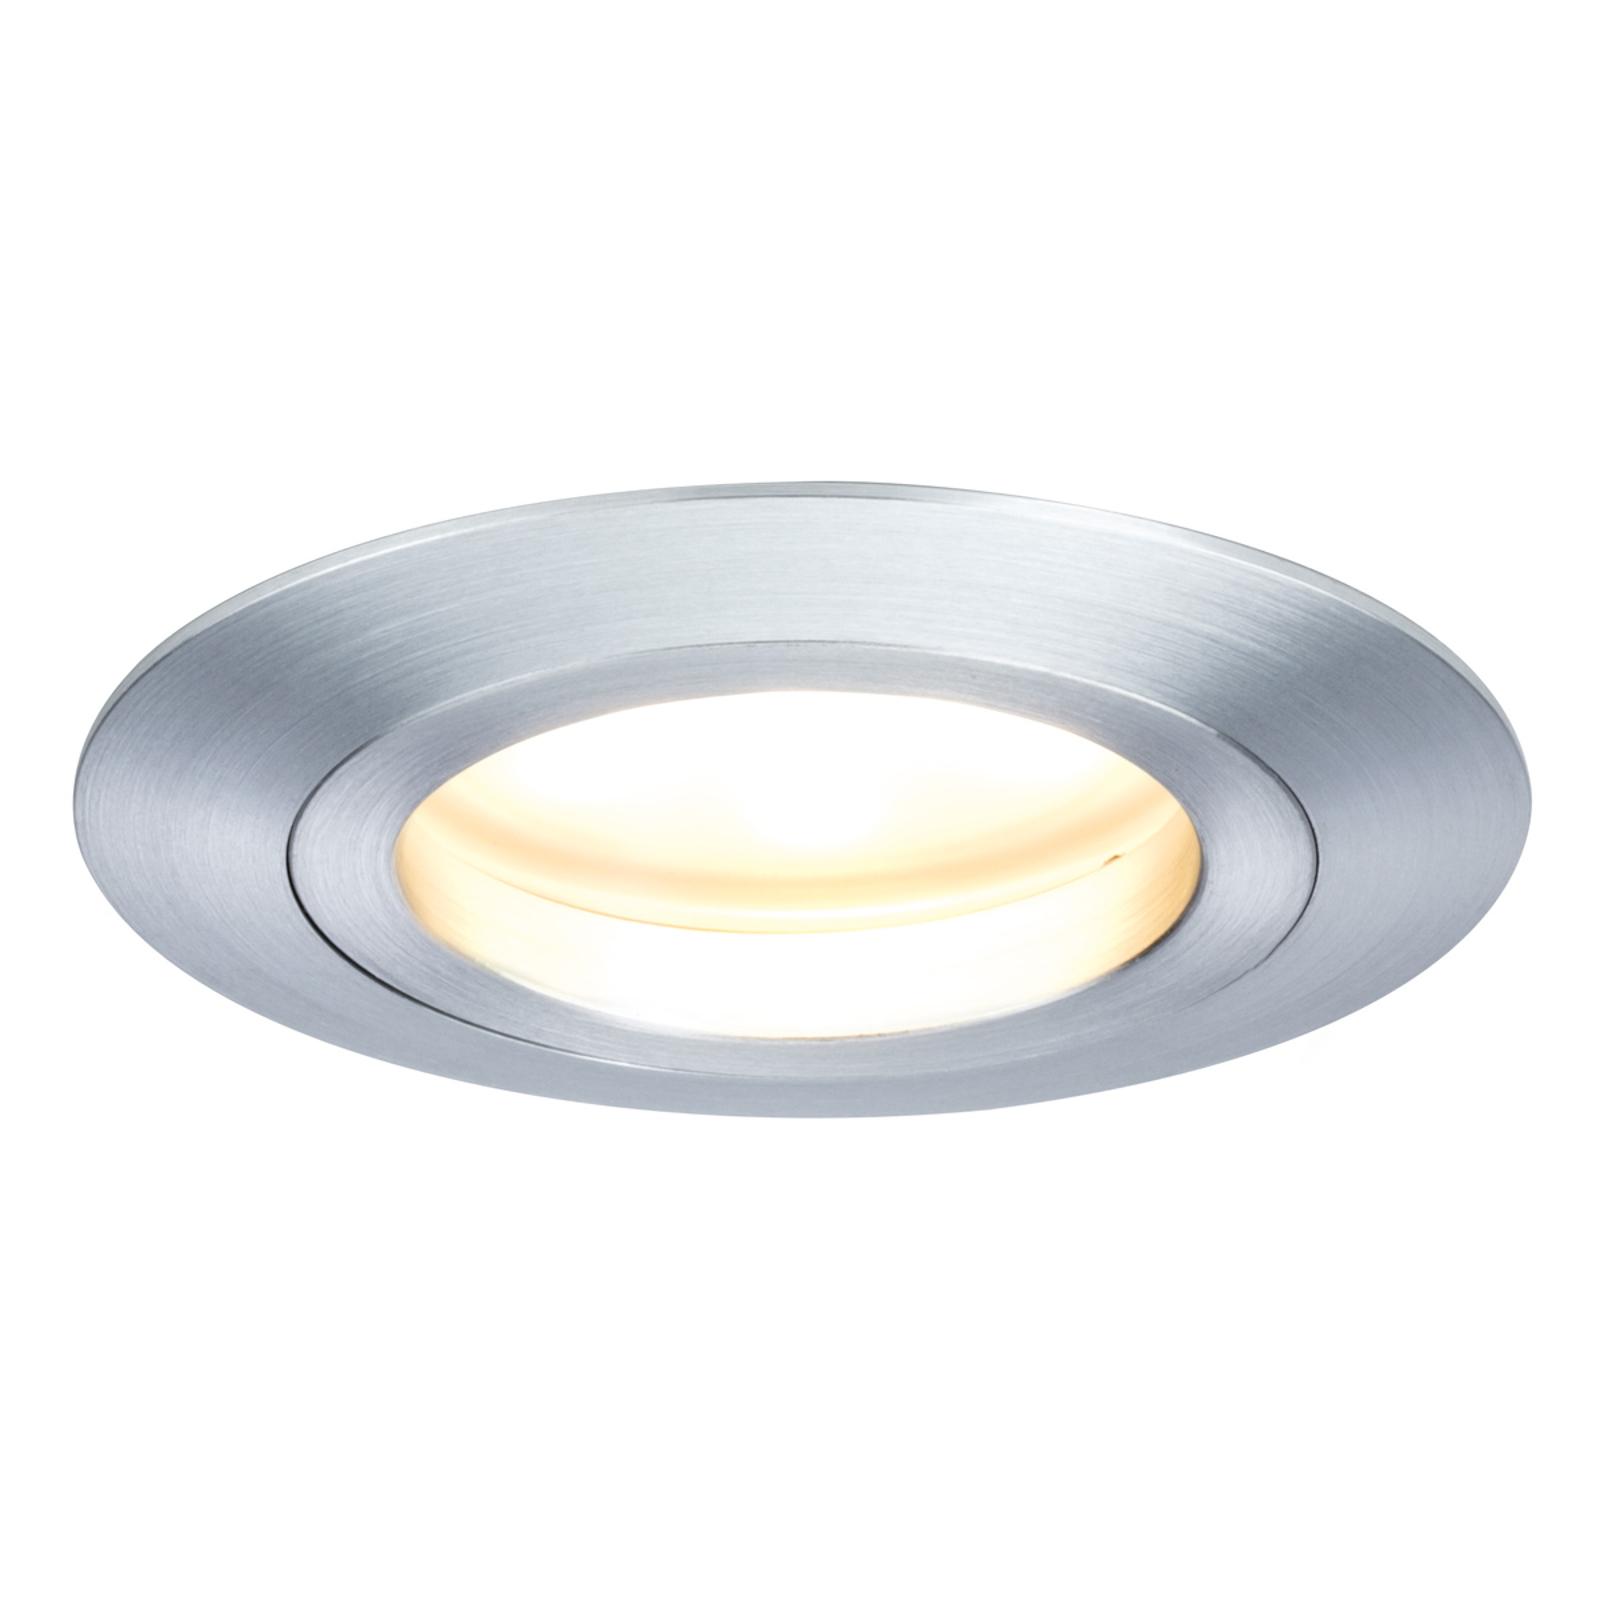 Paulmann Coin LED-Einbauleuchte IP44, 3er alu